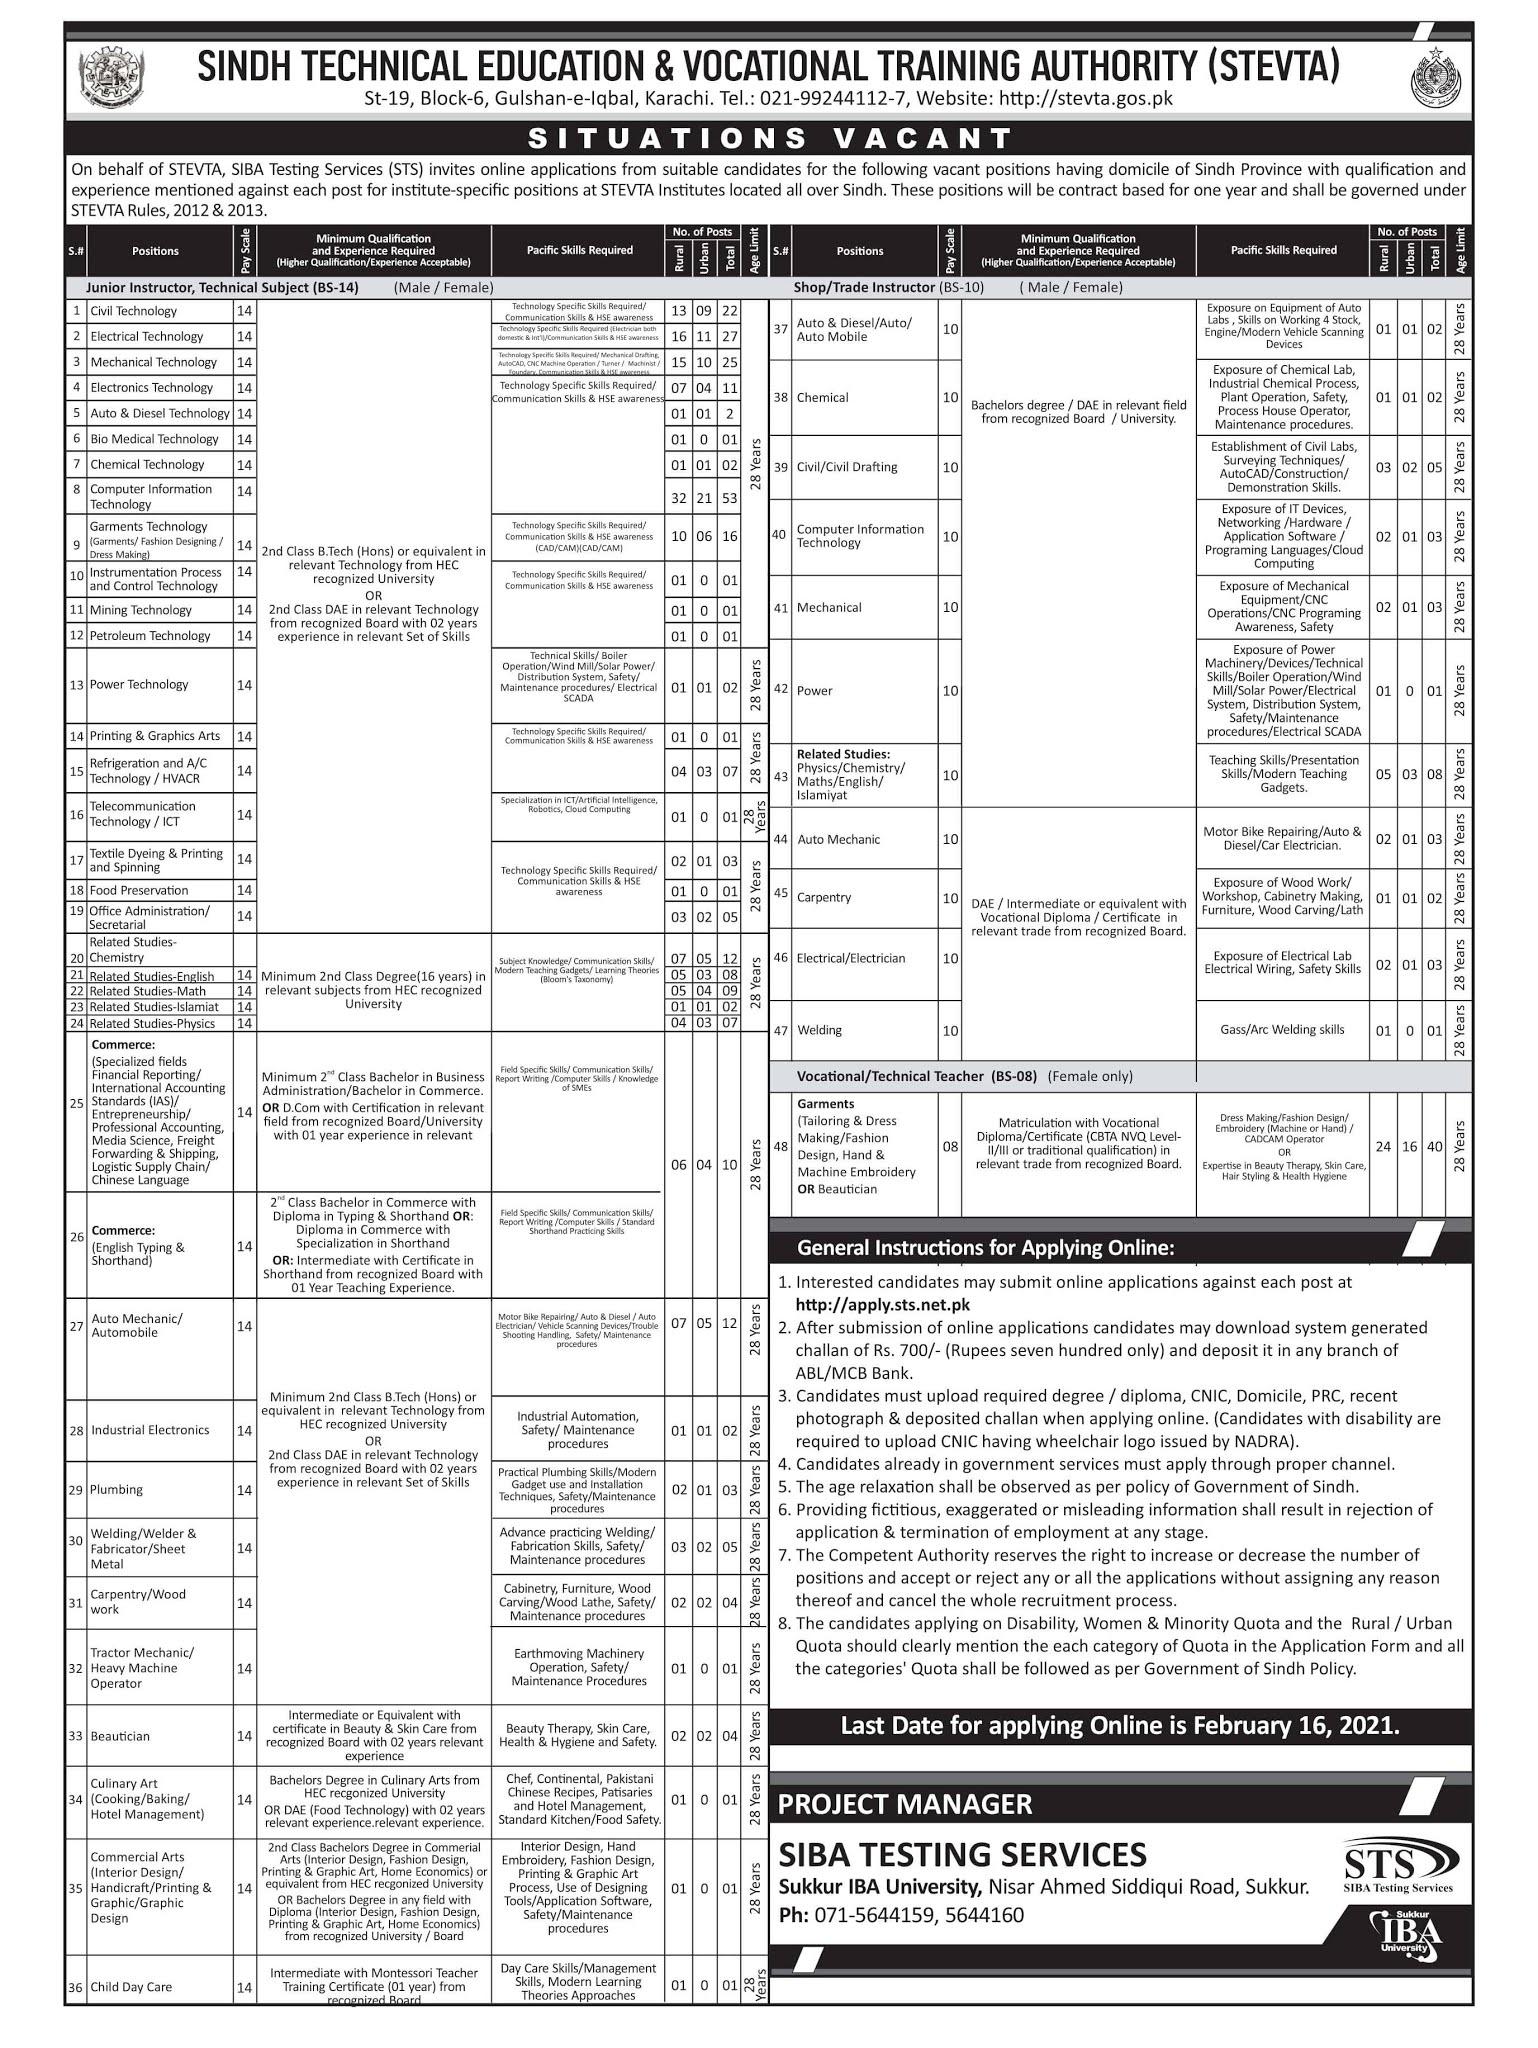 STEVTA Sindh Technical Education & Vocational Training Authority Jobs 2021 Via SIBA STS Testing Service Apply Online